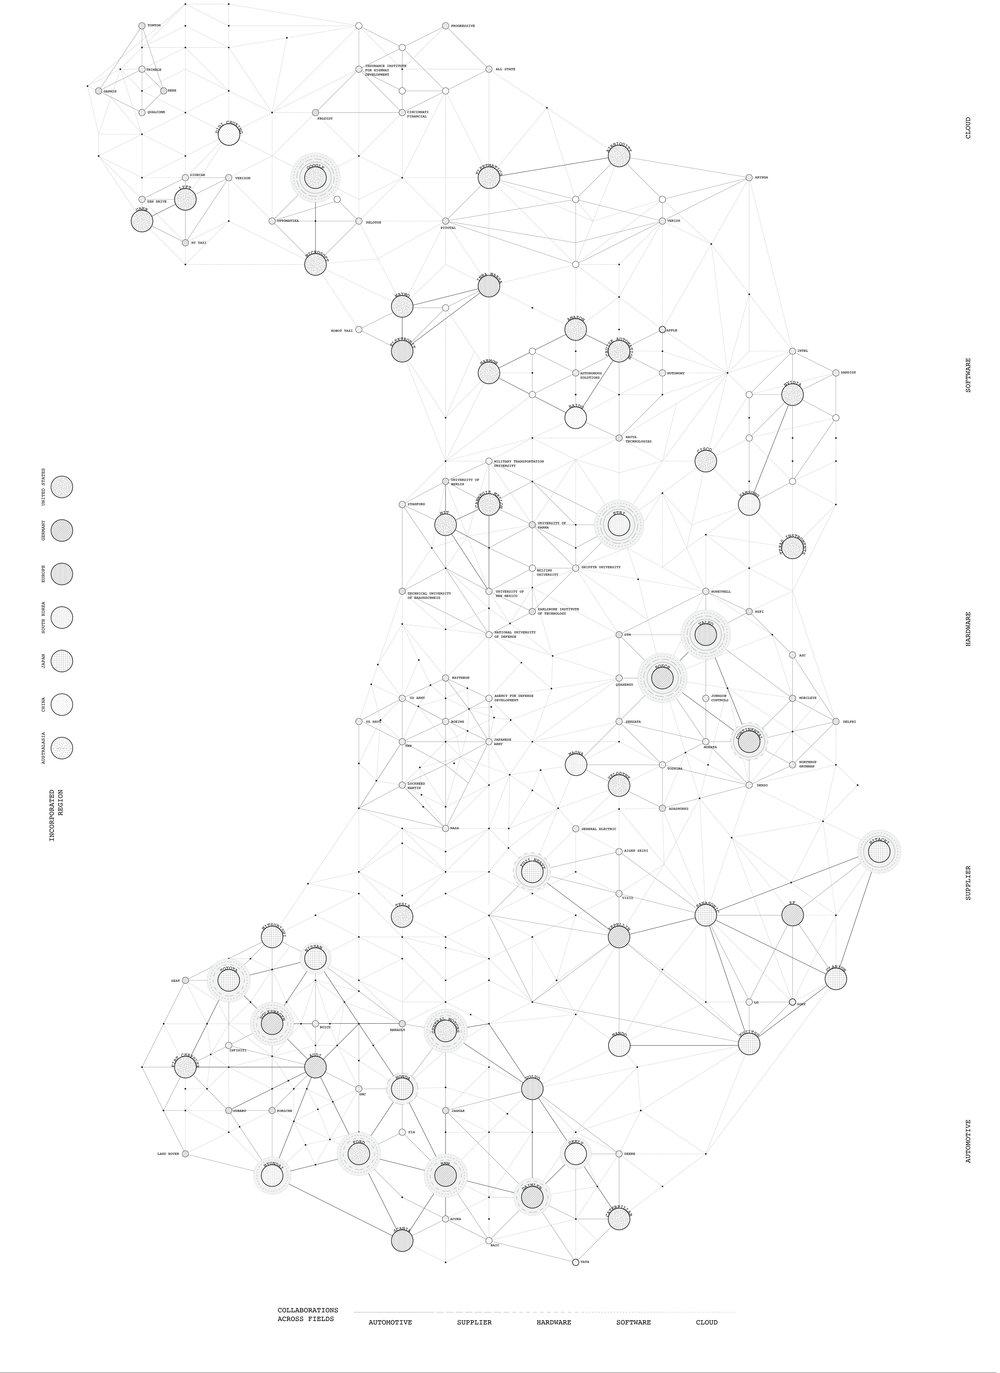 170201_Network_FINAL.jpg